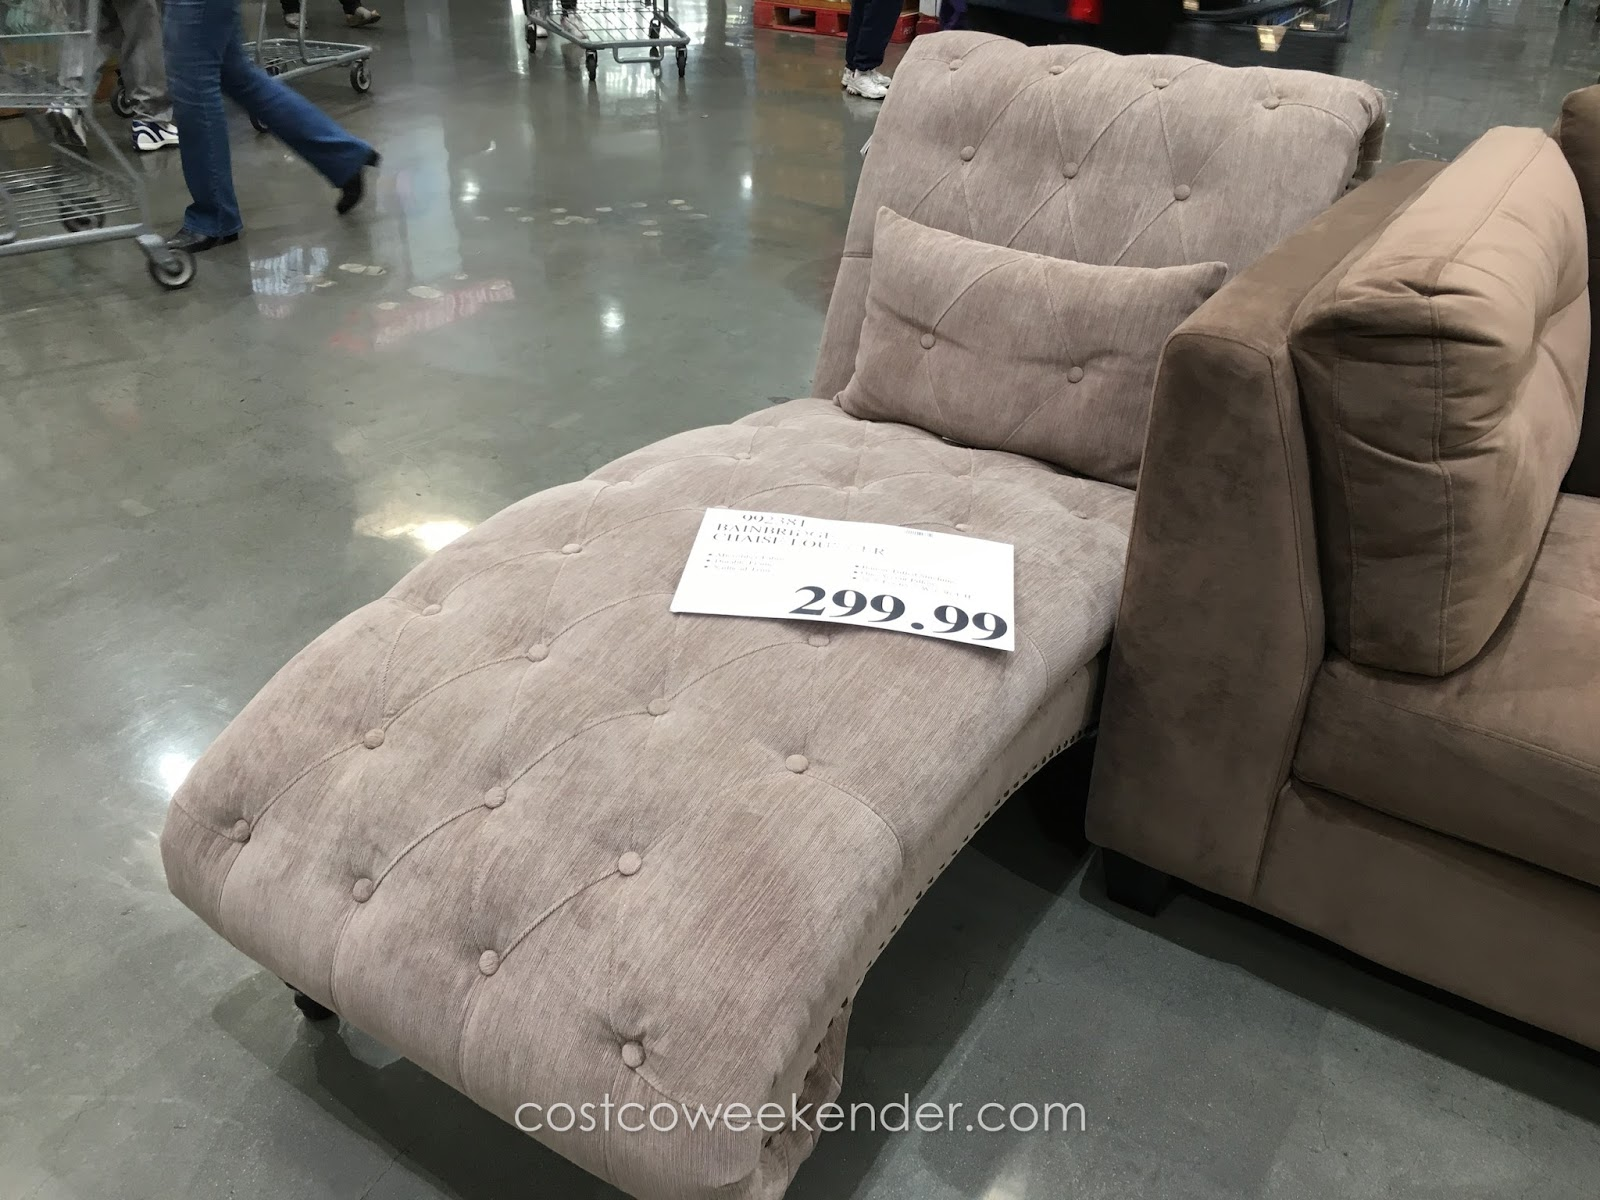 Costco Lounge Chairs Swing Chair Amart Bainbridge Chaise Lounger Weekender